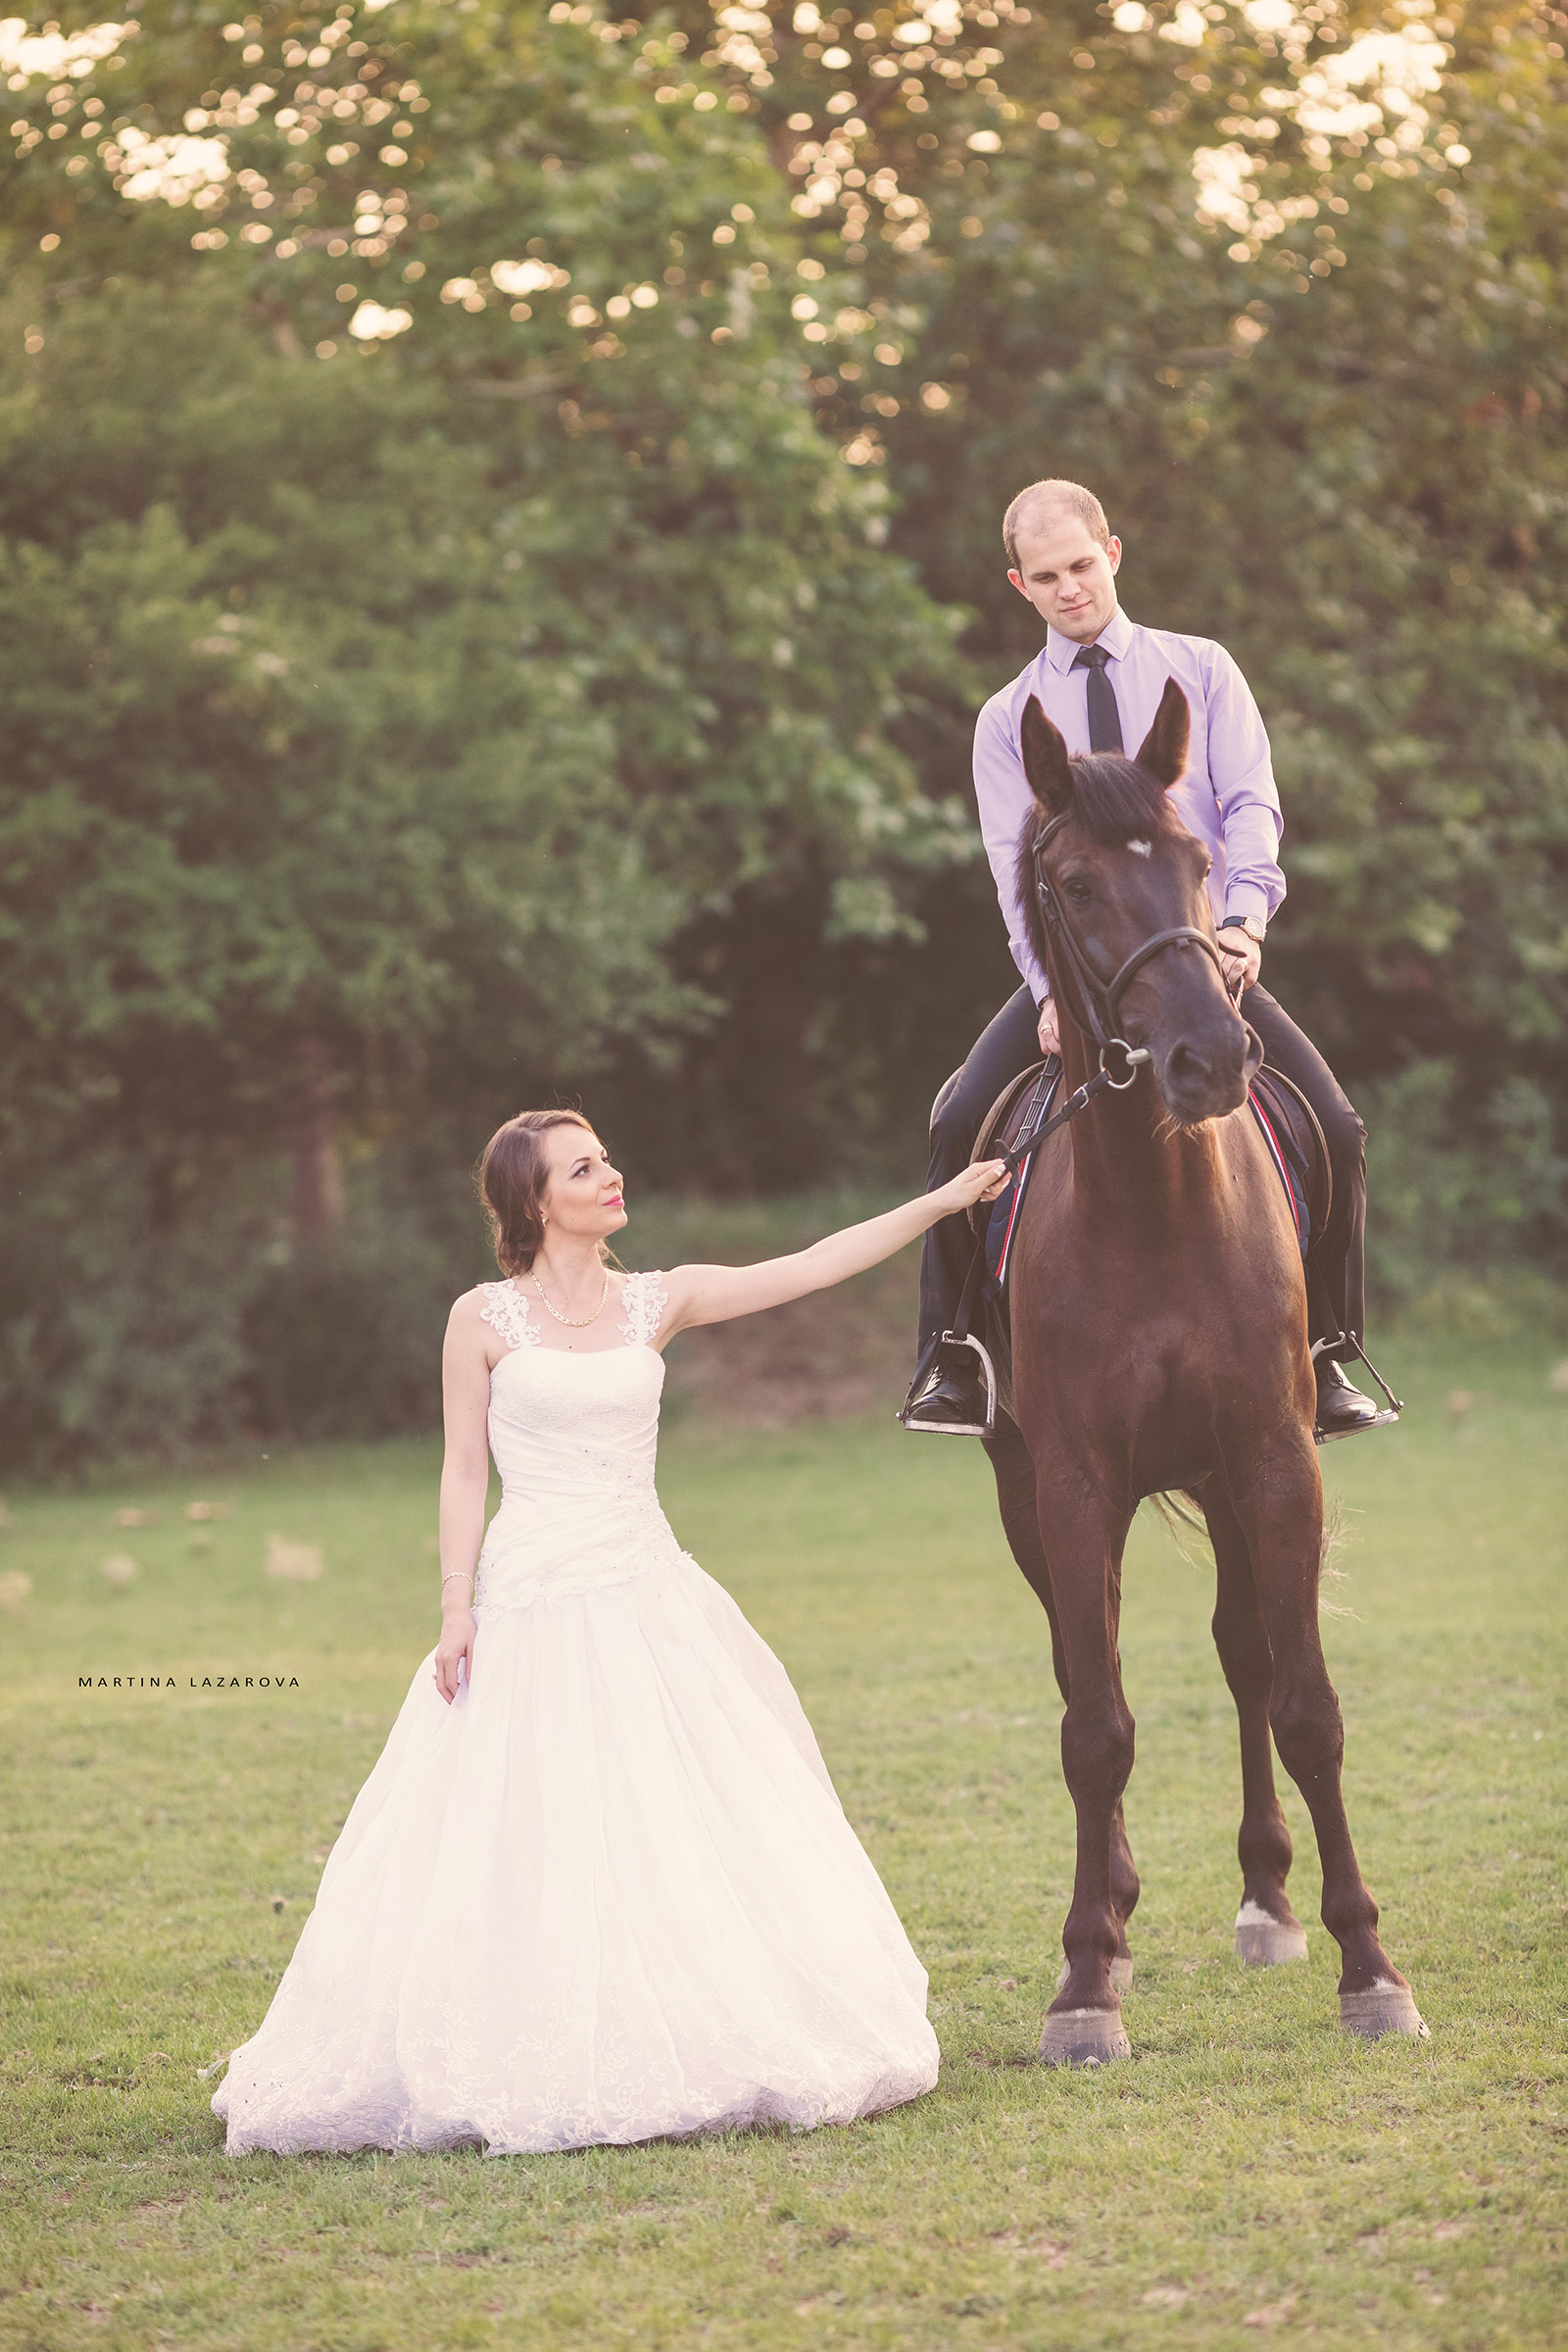 Wedding-PhotoShoot-A&S-72